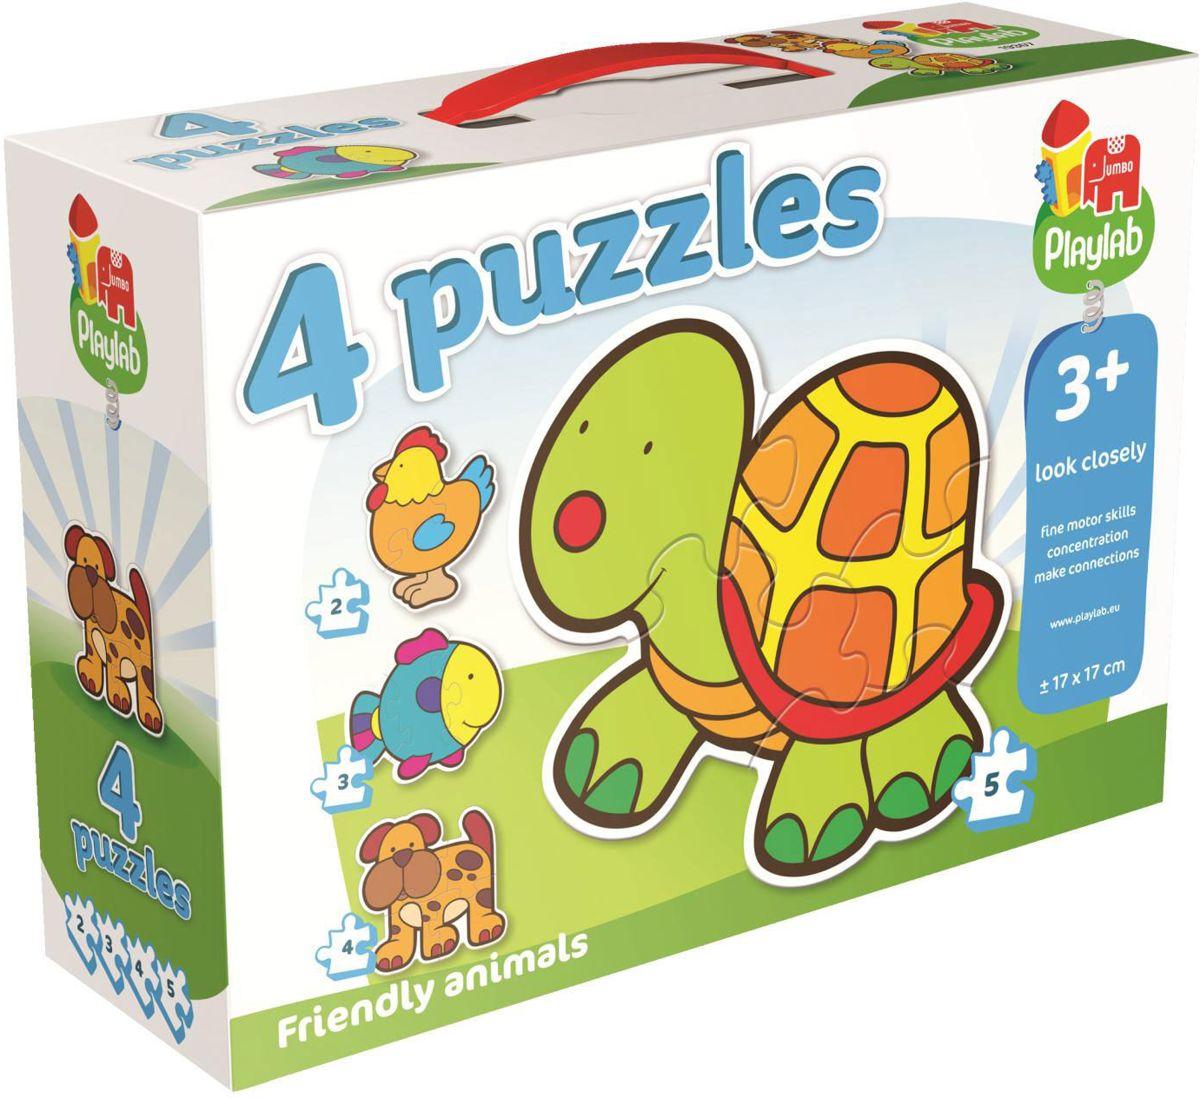 4-in-1 vriendelijke dieren Legpuzzels - Playlab - Jumbo